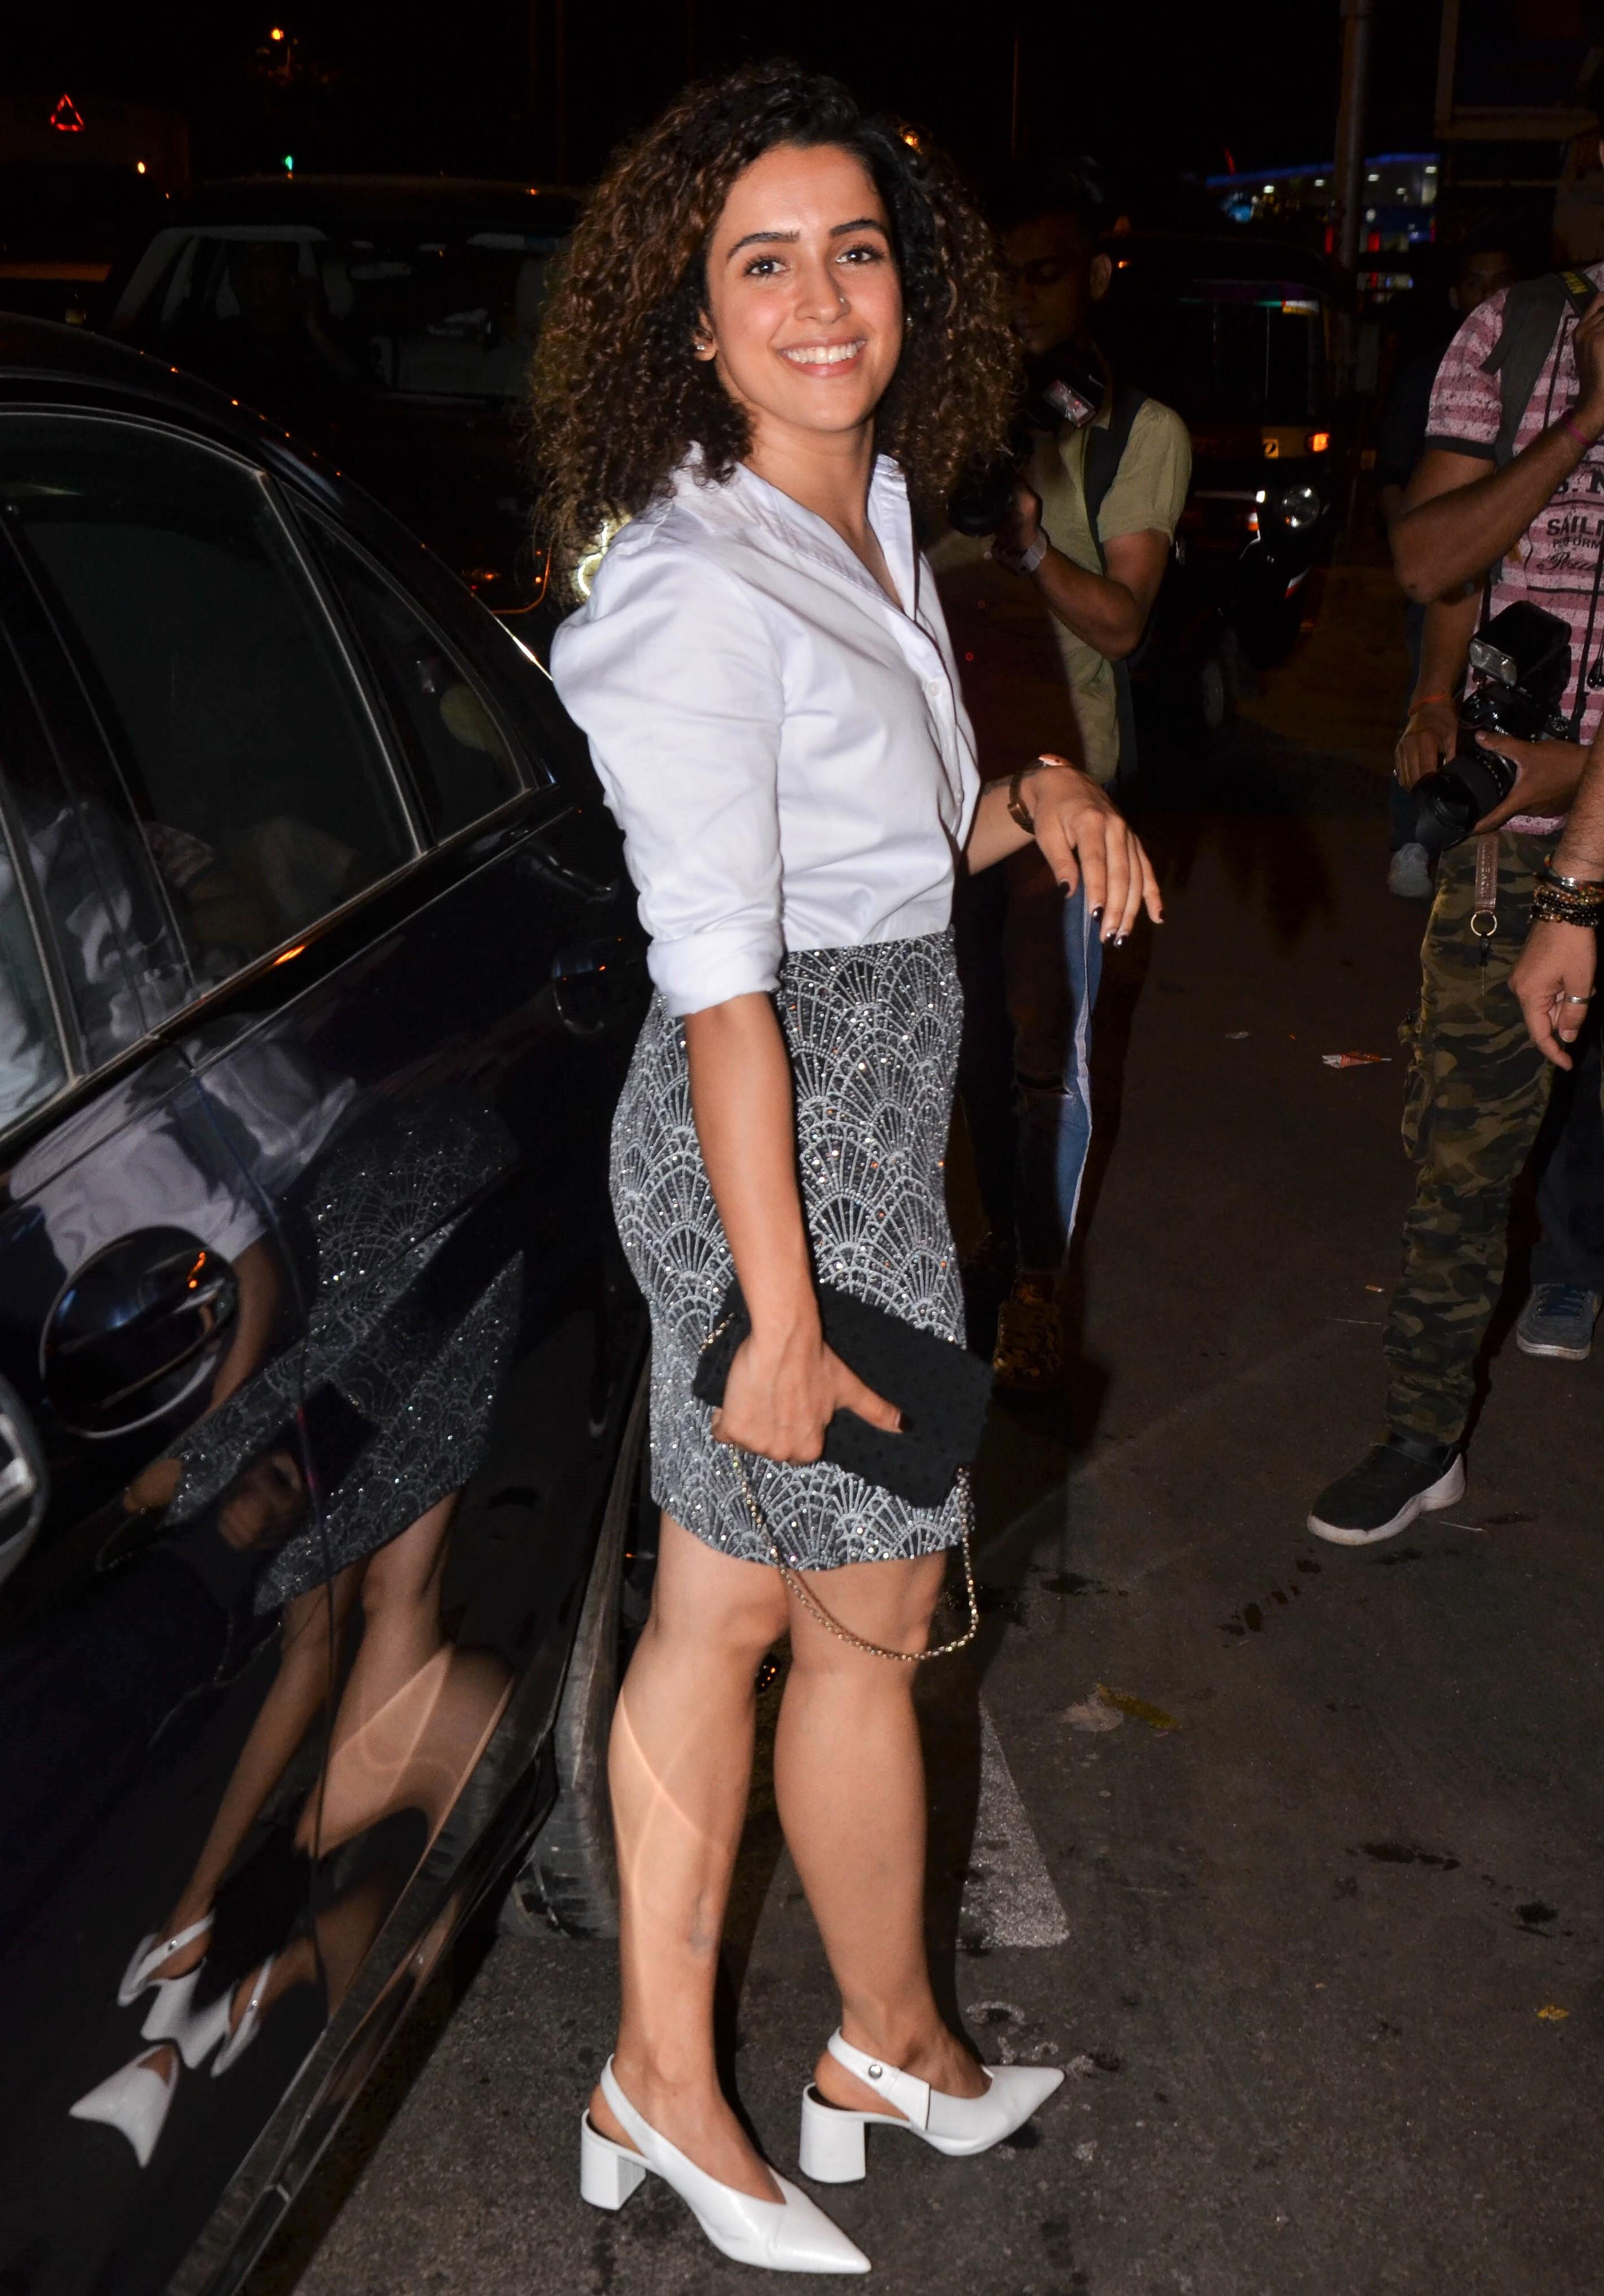 Vicky Kaushal and Sanya Malhotra Spotted in Bandra! See Pics